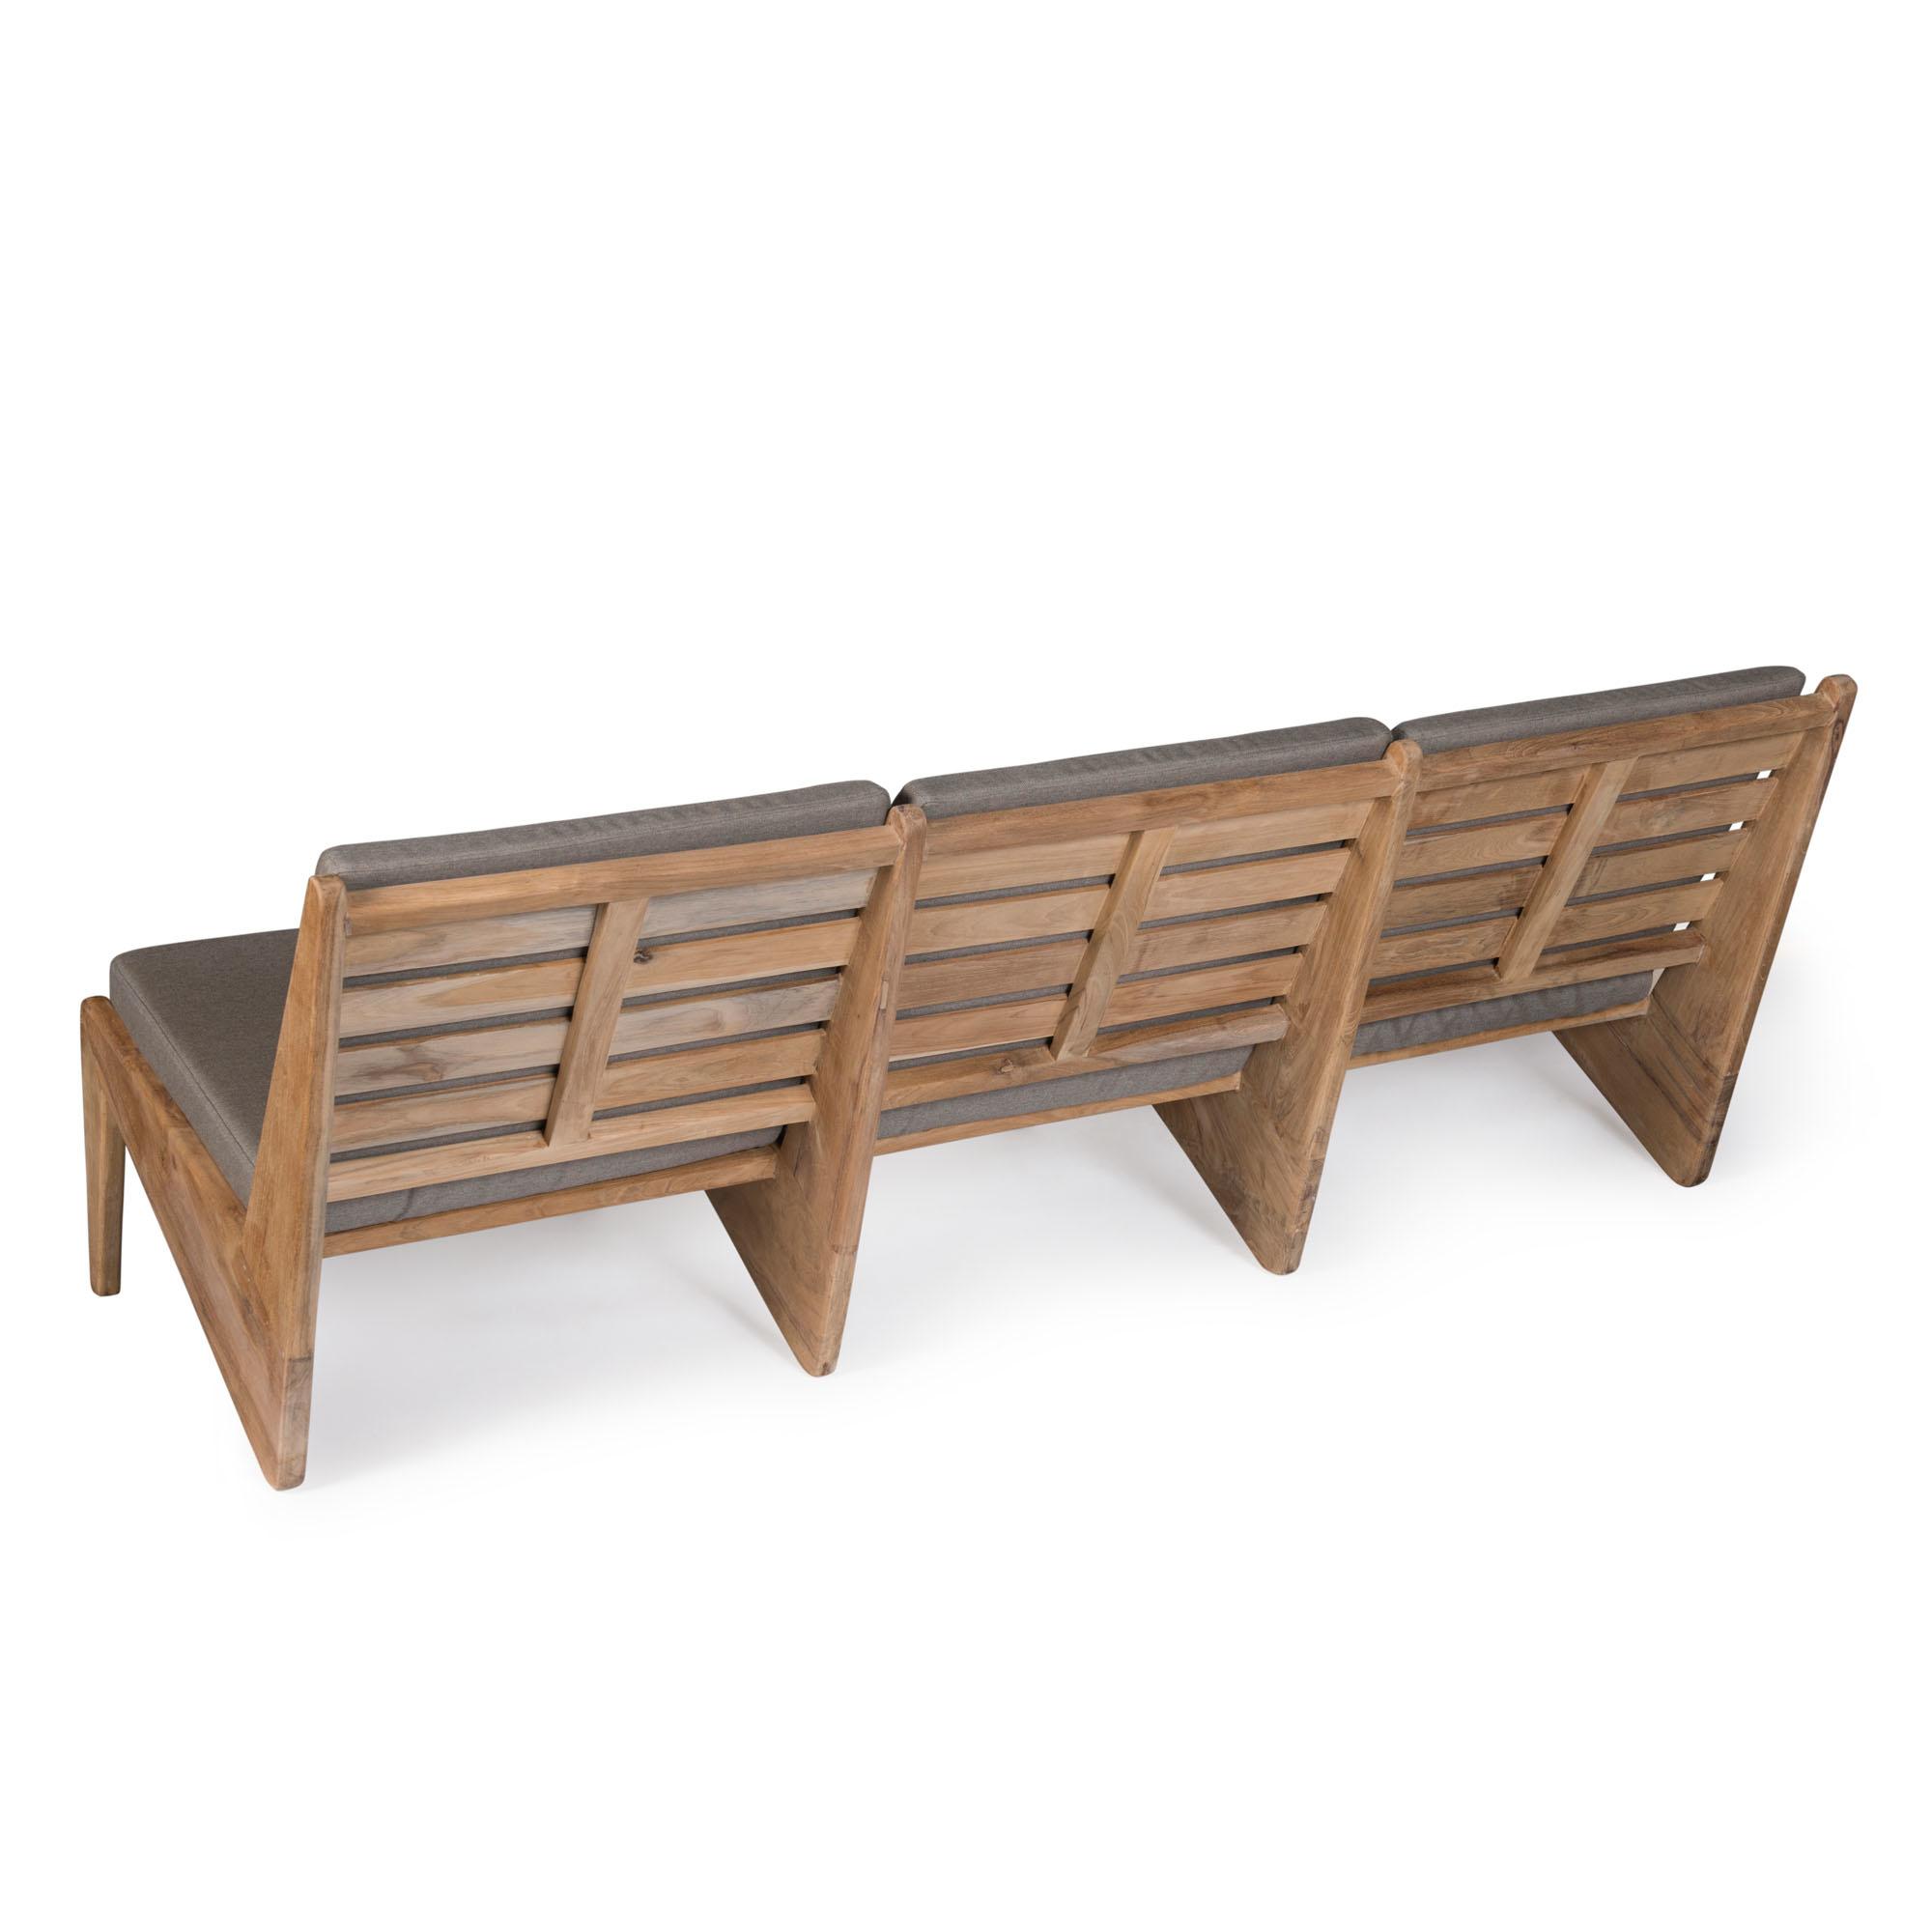 Kangaroo Chair  Bench 3 - Teak Outdoor with Cushion-4